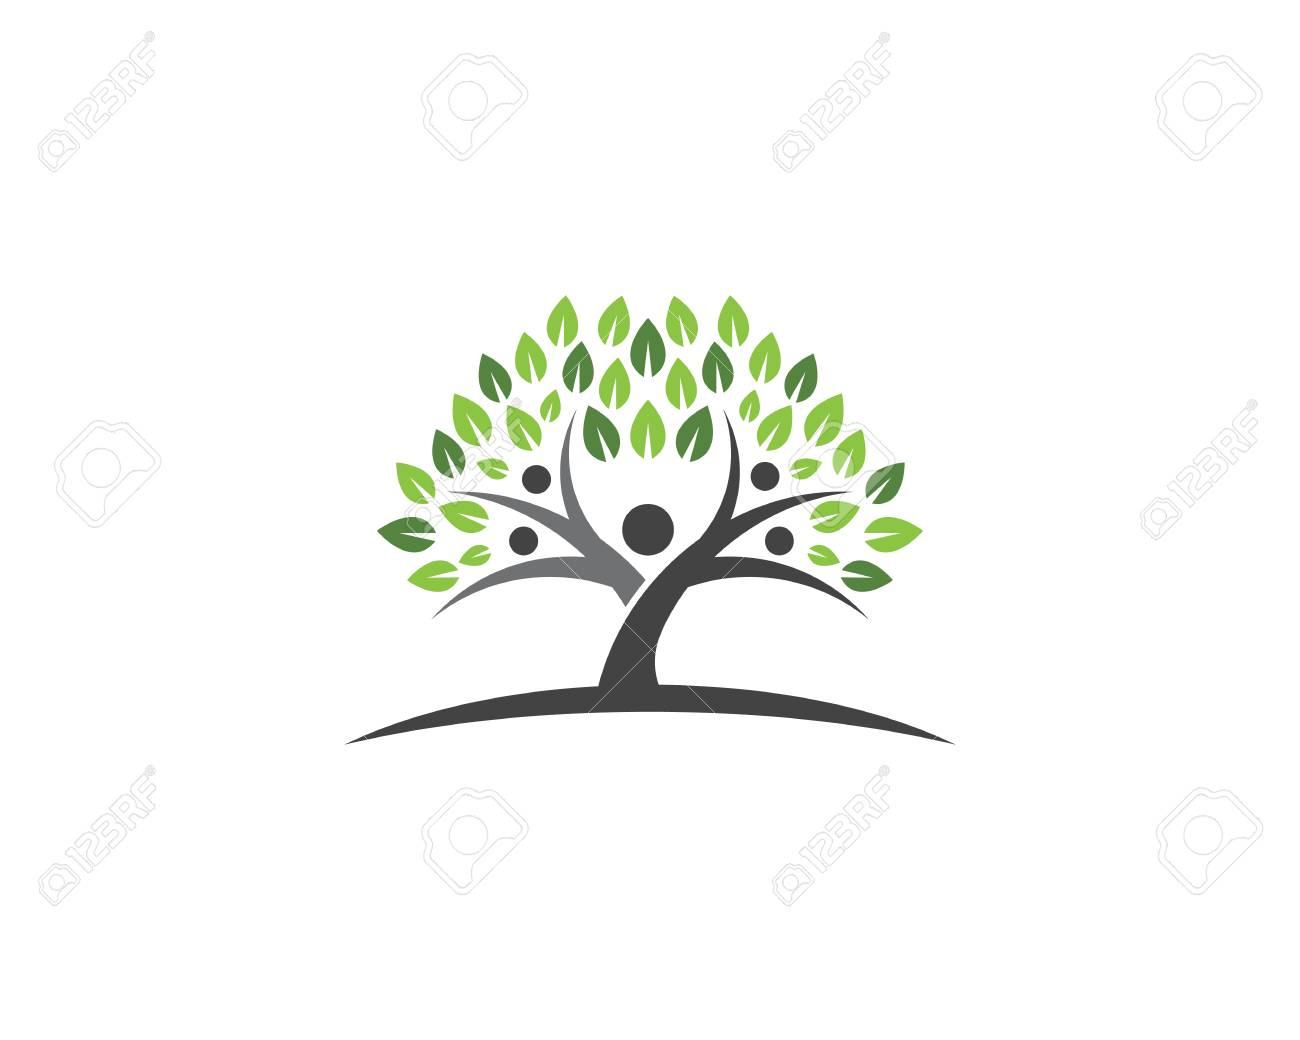 Family Tree Design Template Family Tree Ogo Design Template Royalty